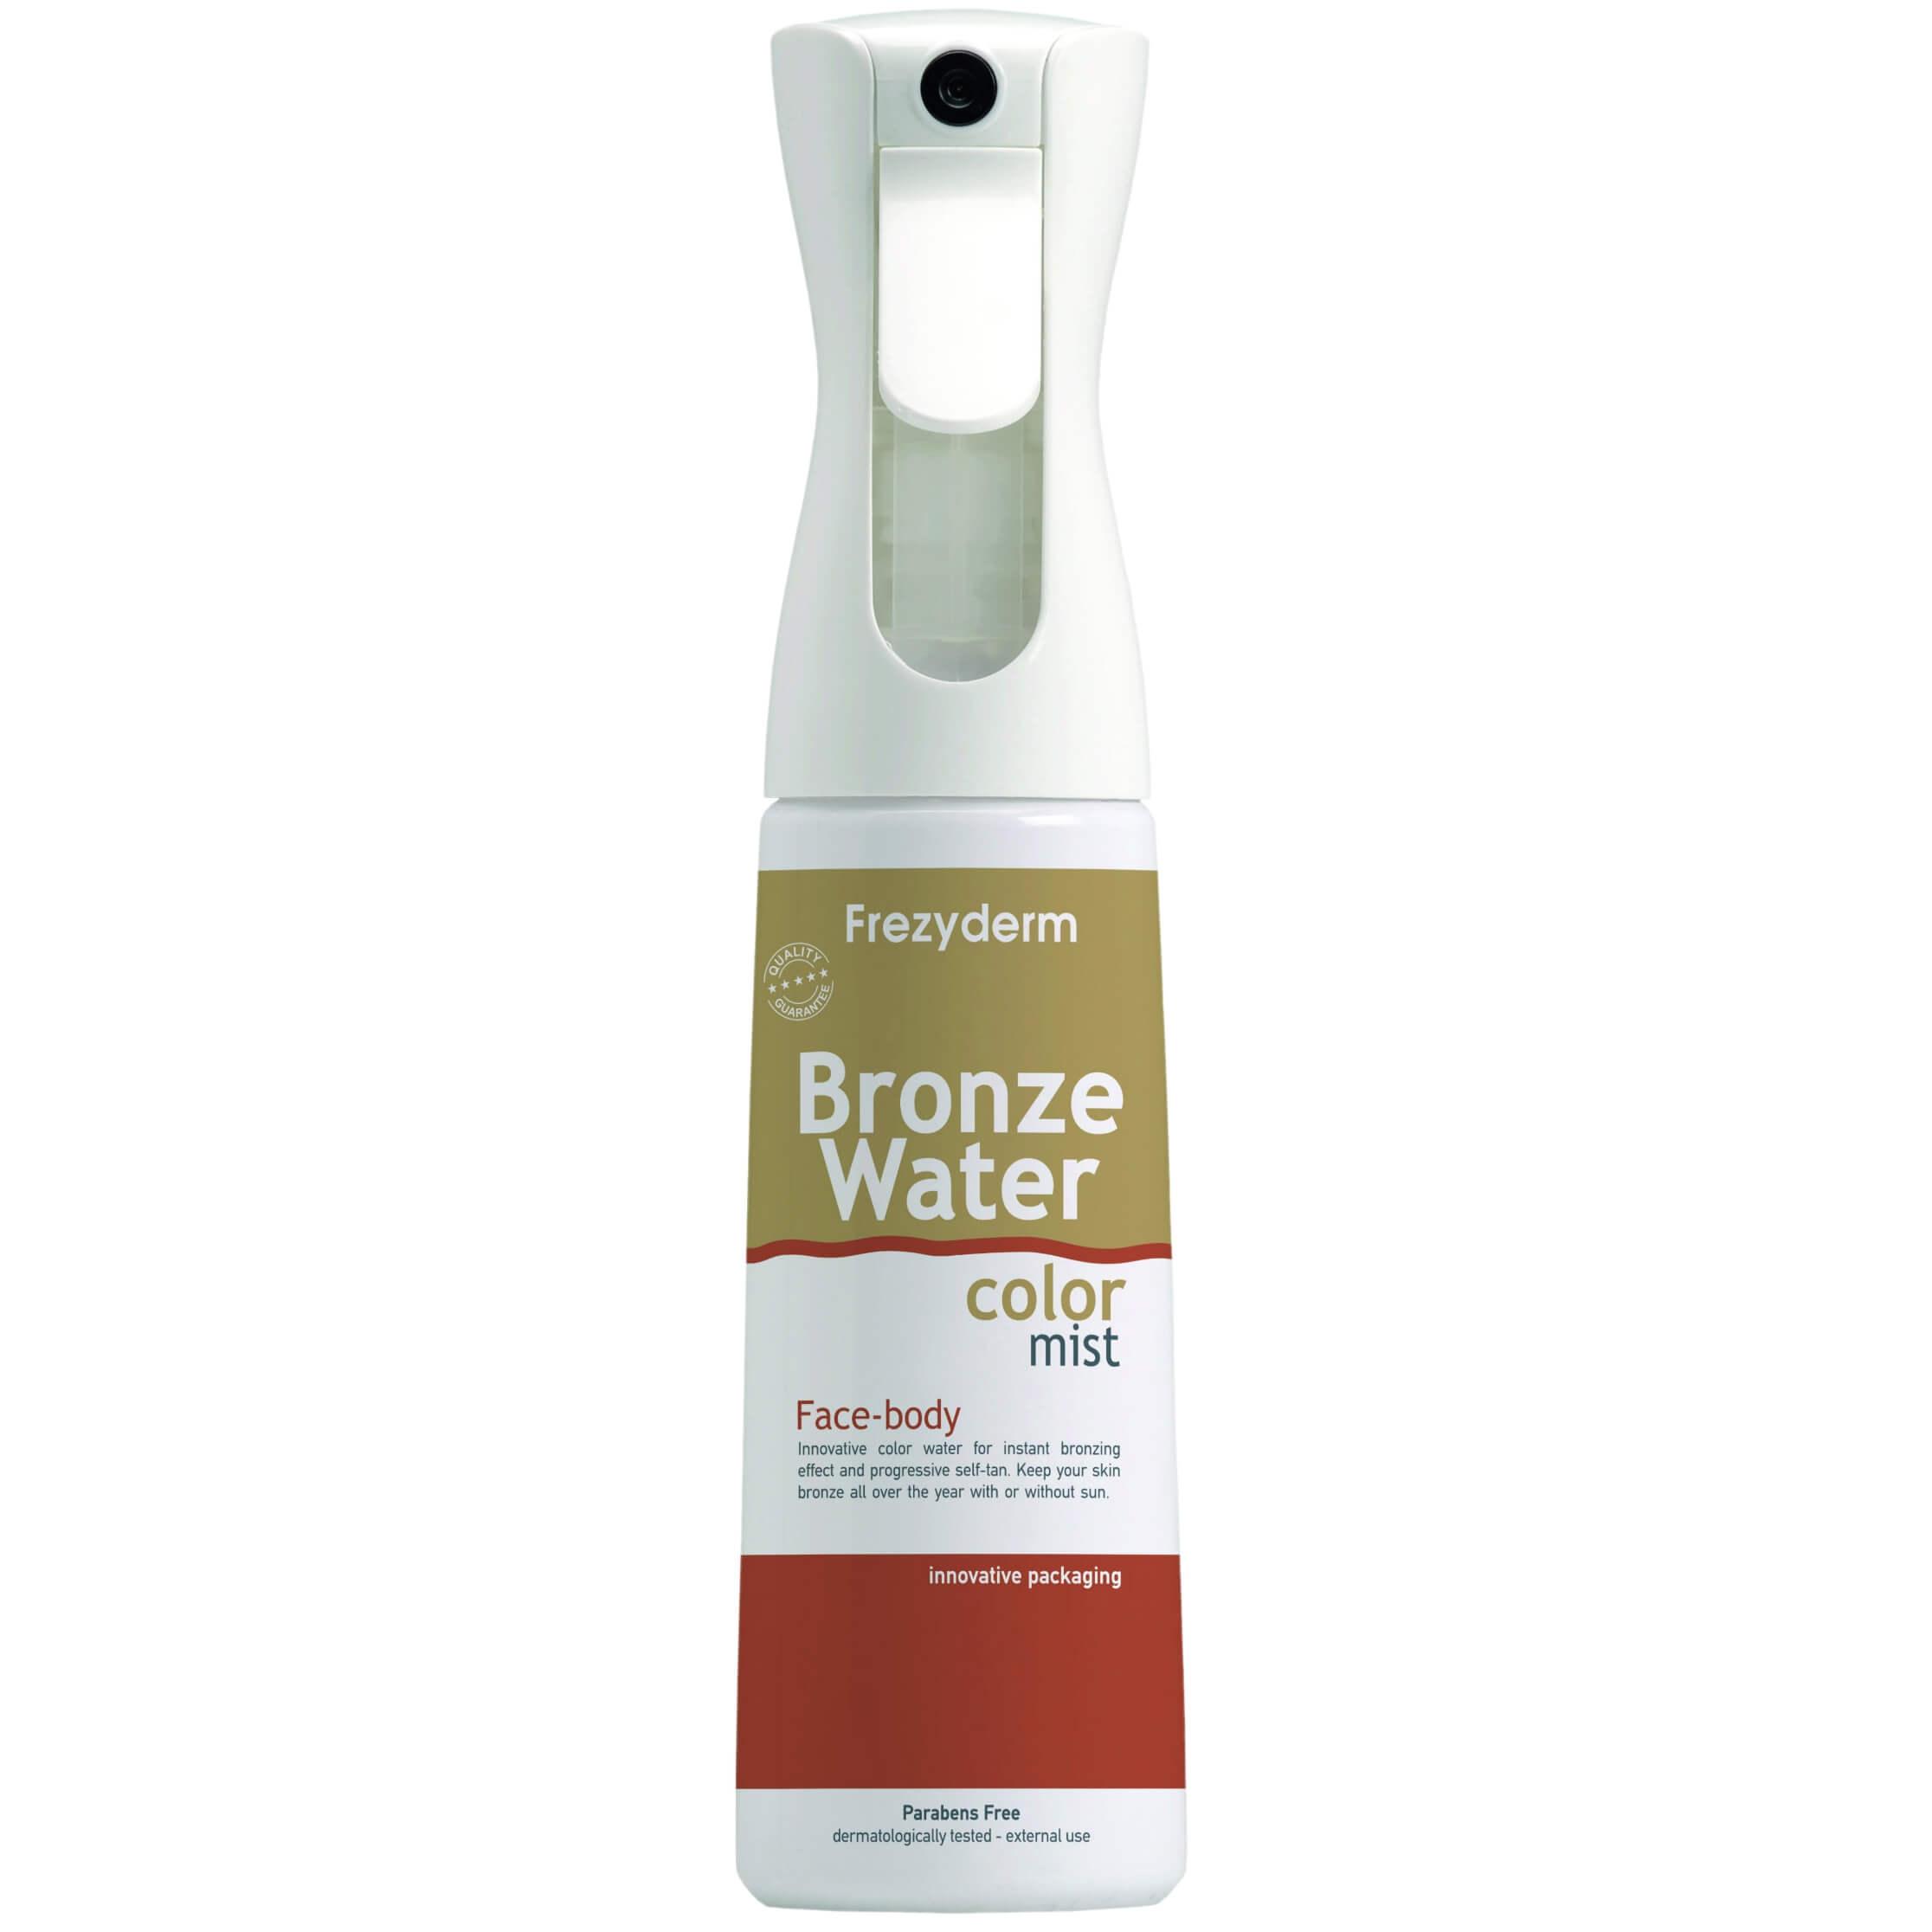 Frezyderm Water Color Mist Spray Bronze Spray Πρόσωπου& Σώματος για Φυσικό Μαύρισμα300ml